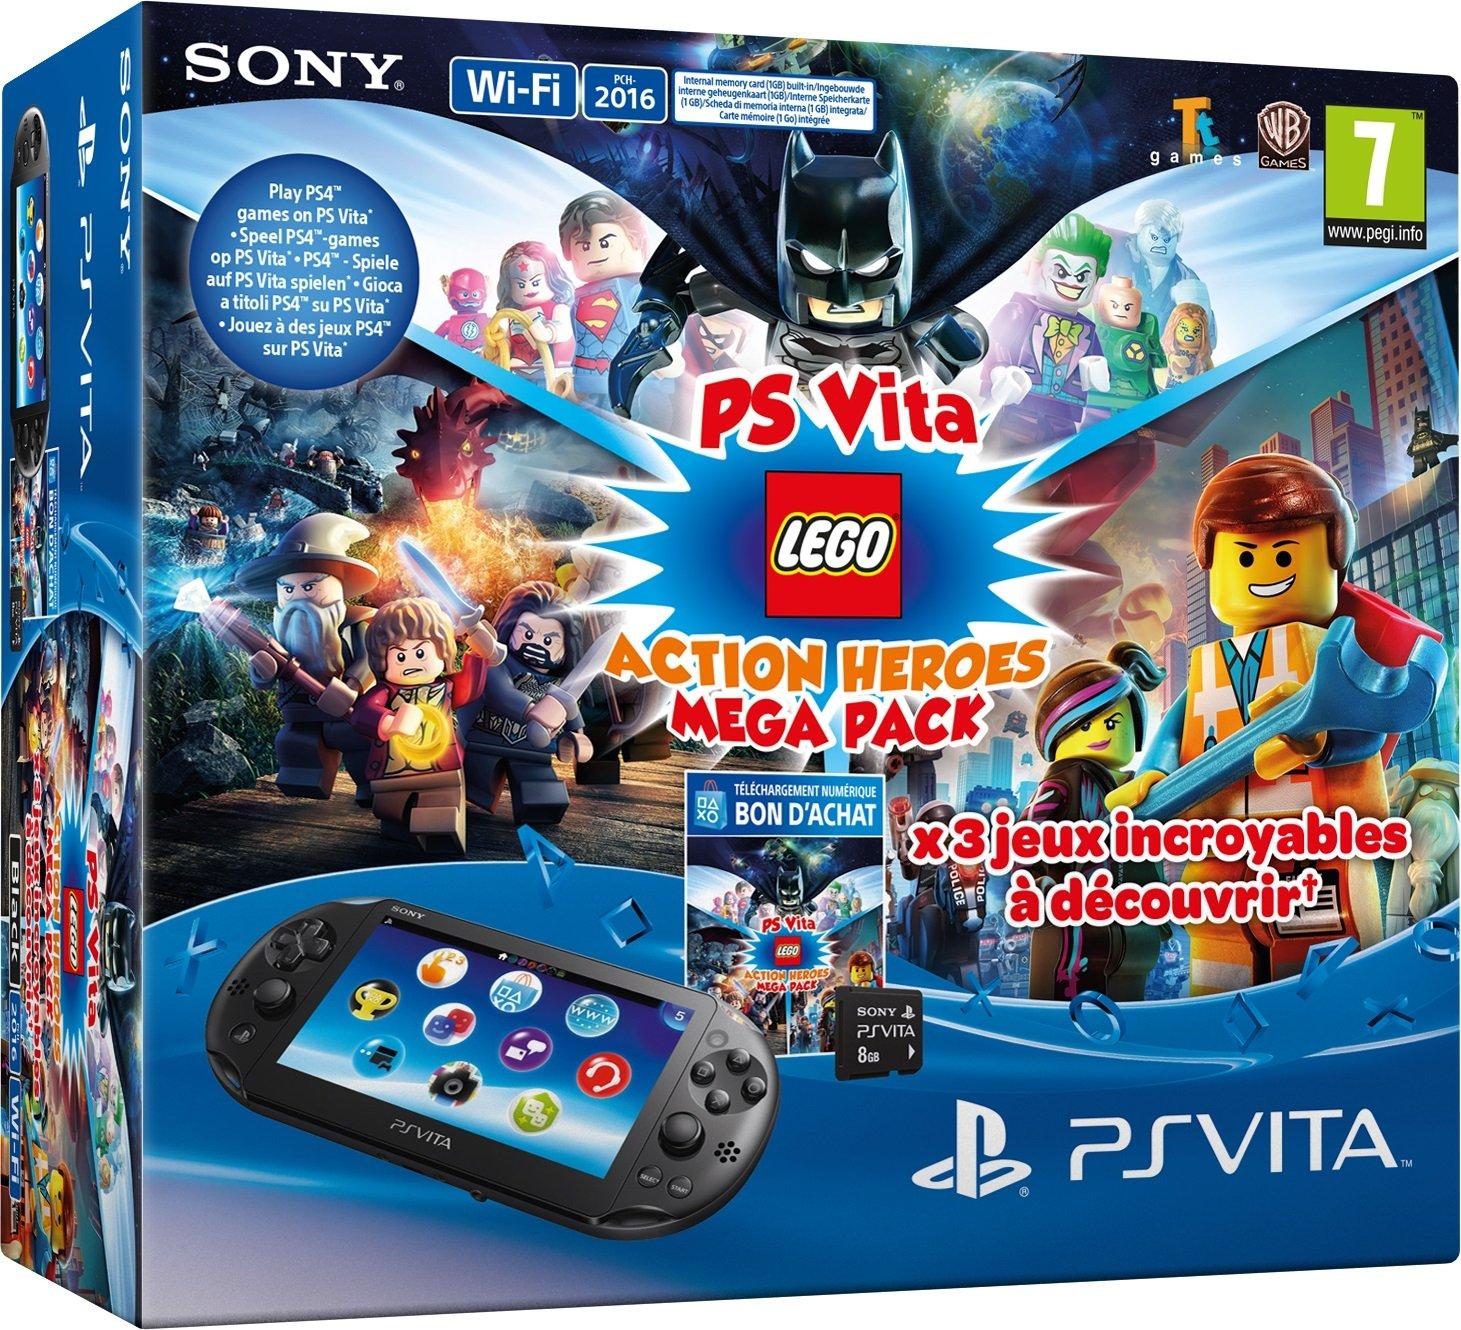 PlayStation Vita - Consola + Megapack Lego Heroes+ 8 GB ...